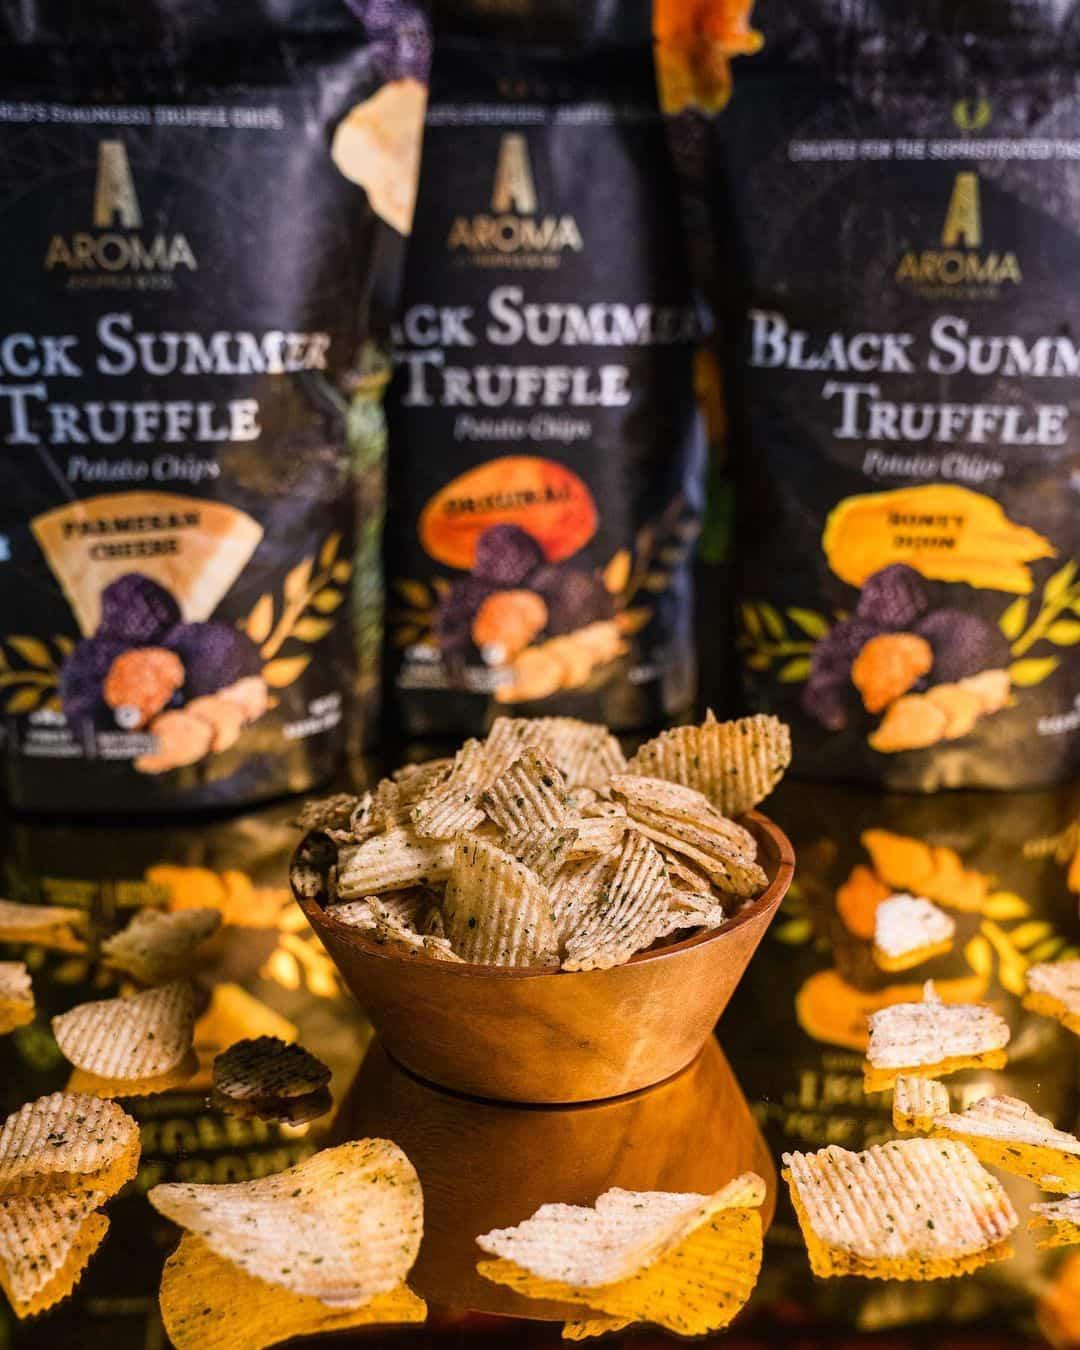 Aroma Truffle Philippines: truffle chips